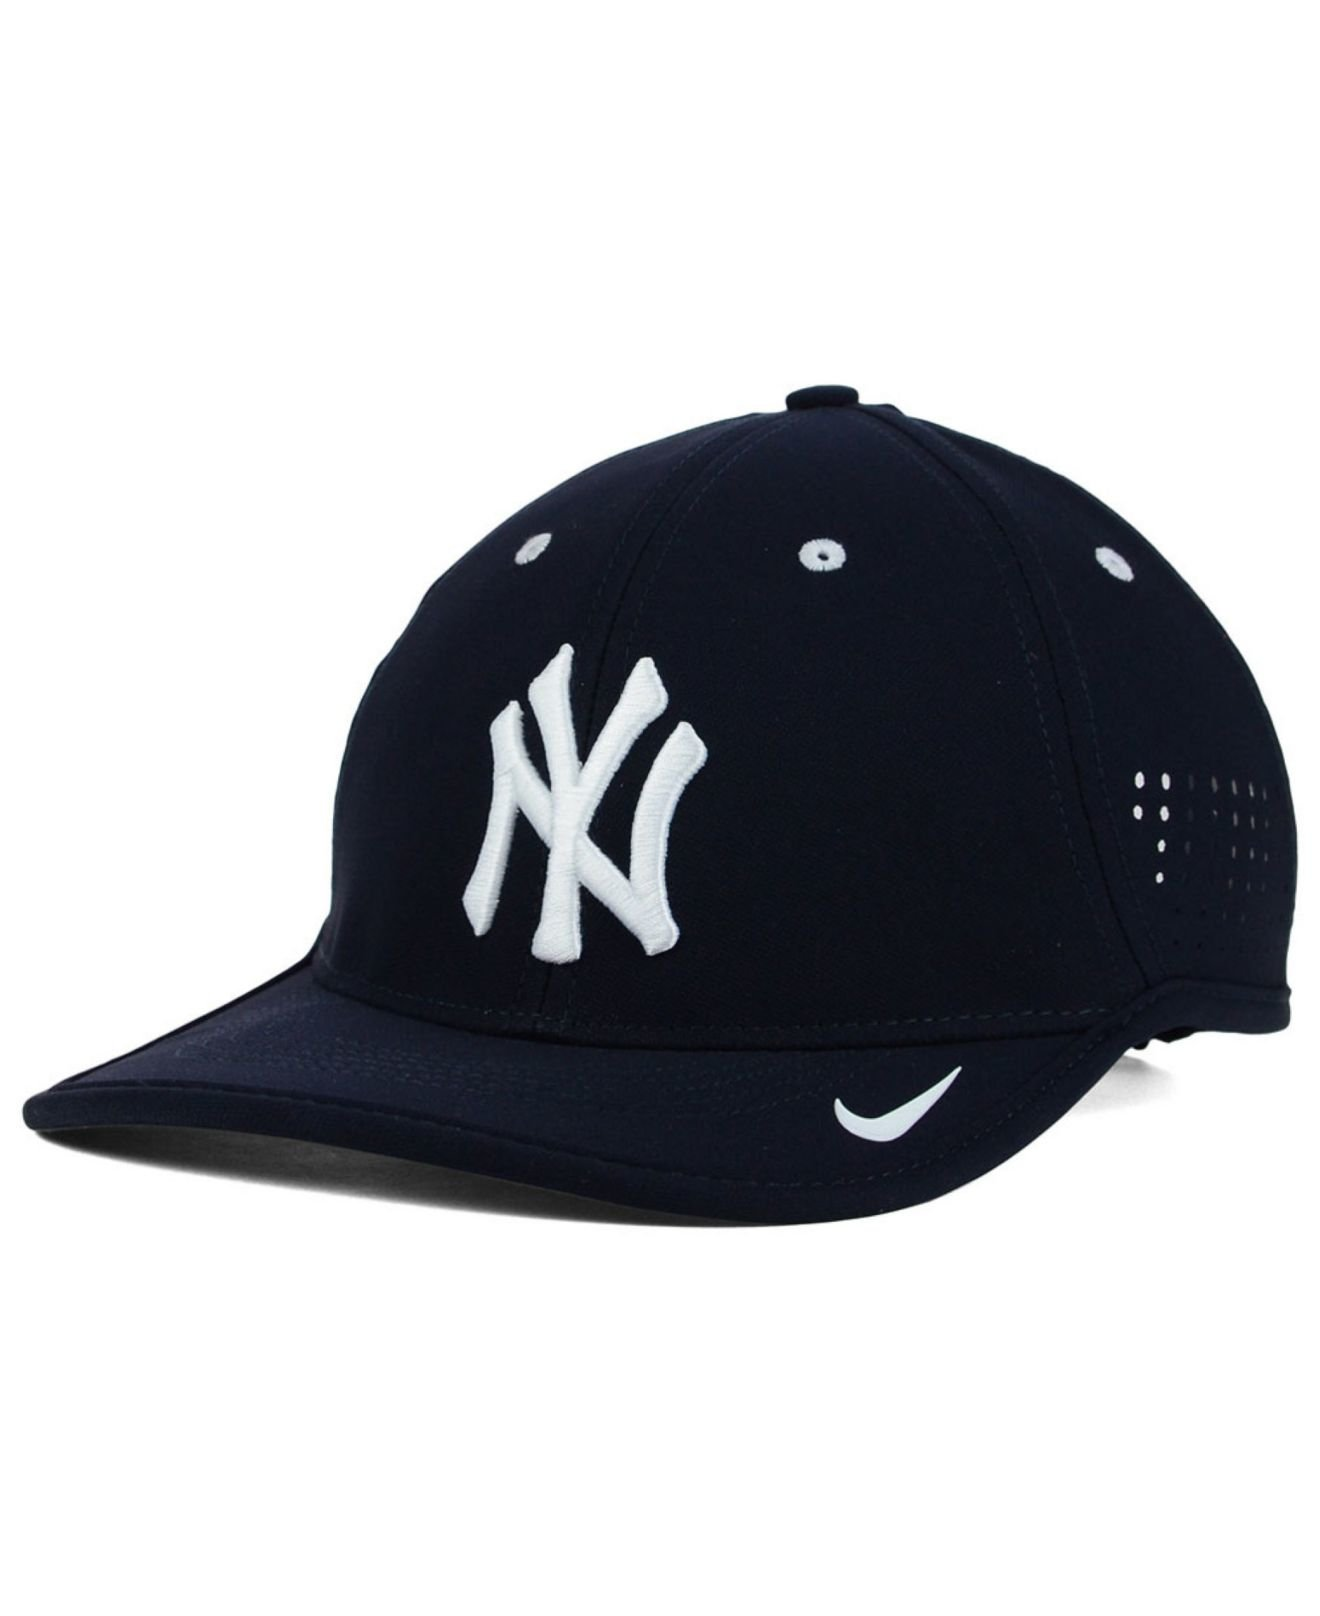 ea80c7a66b6 ... netherlands lyst nike new york yankees vapor swoosh adjustable cap in  blue for men 8531b 8437c